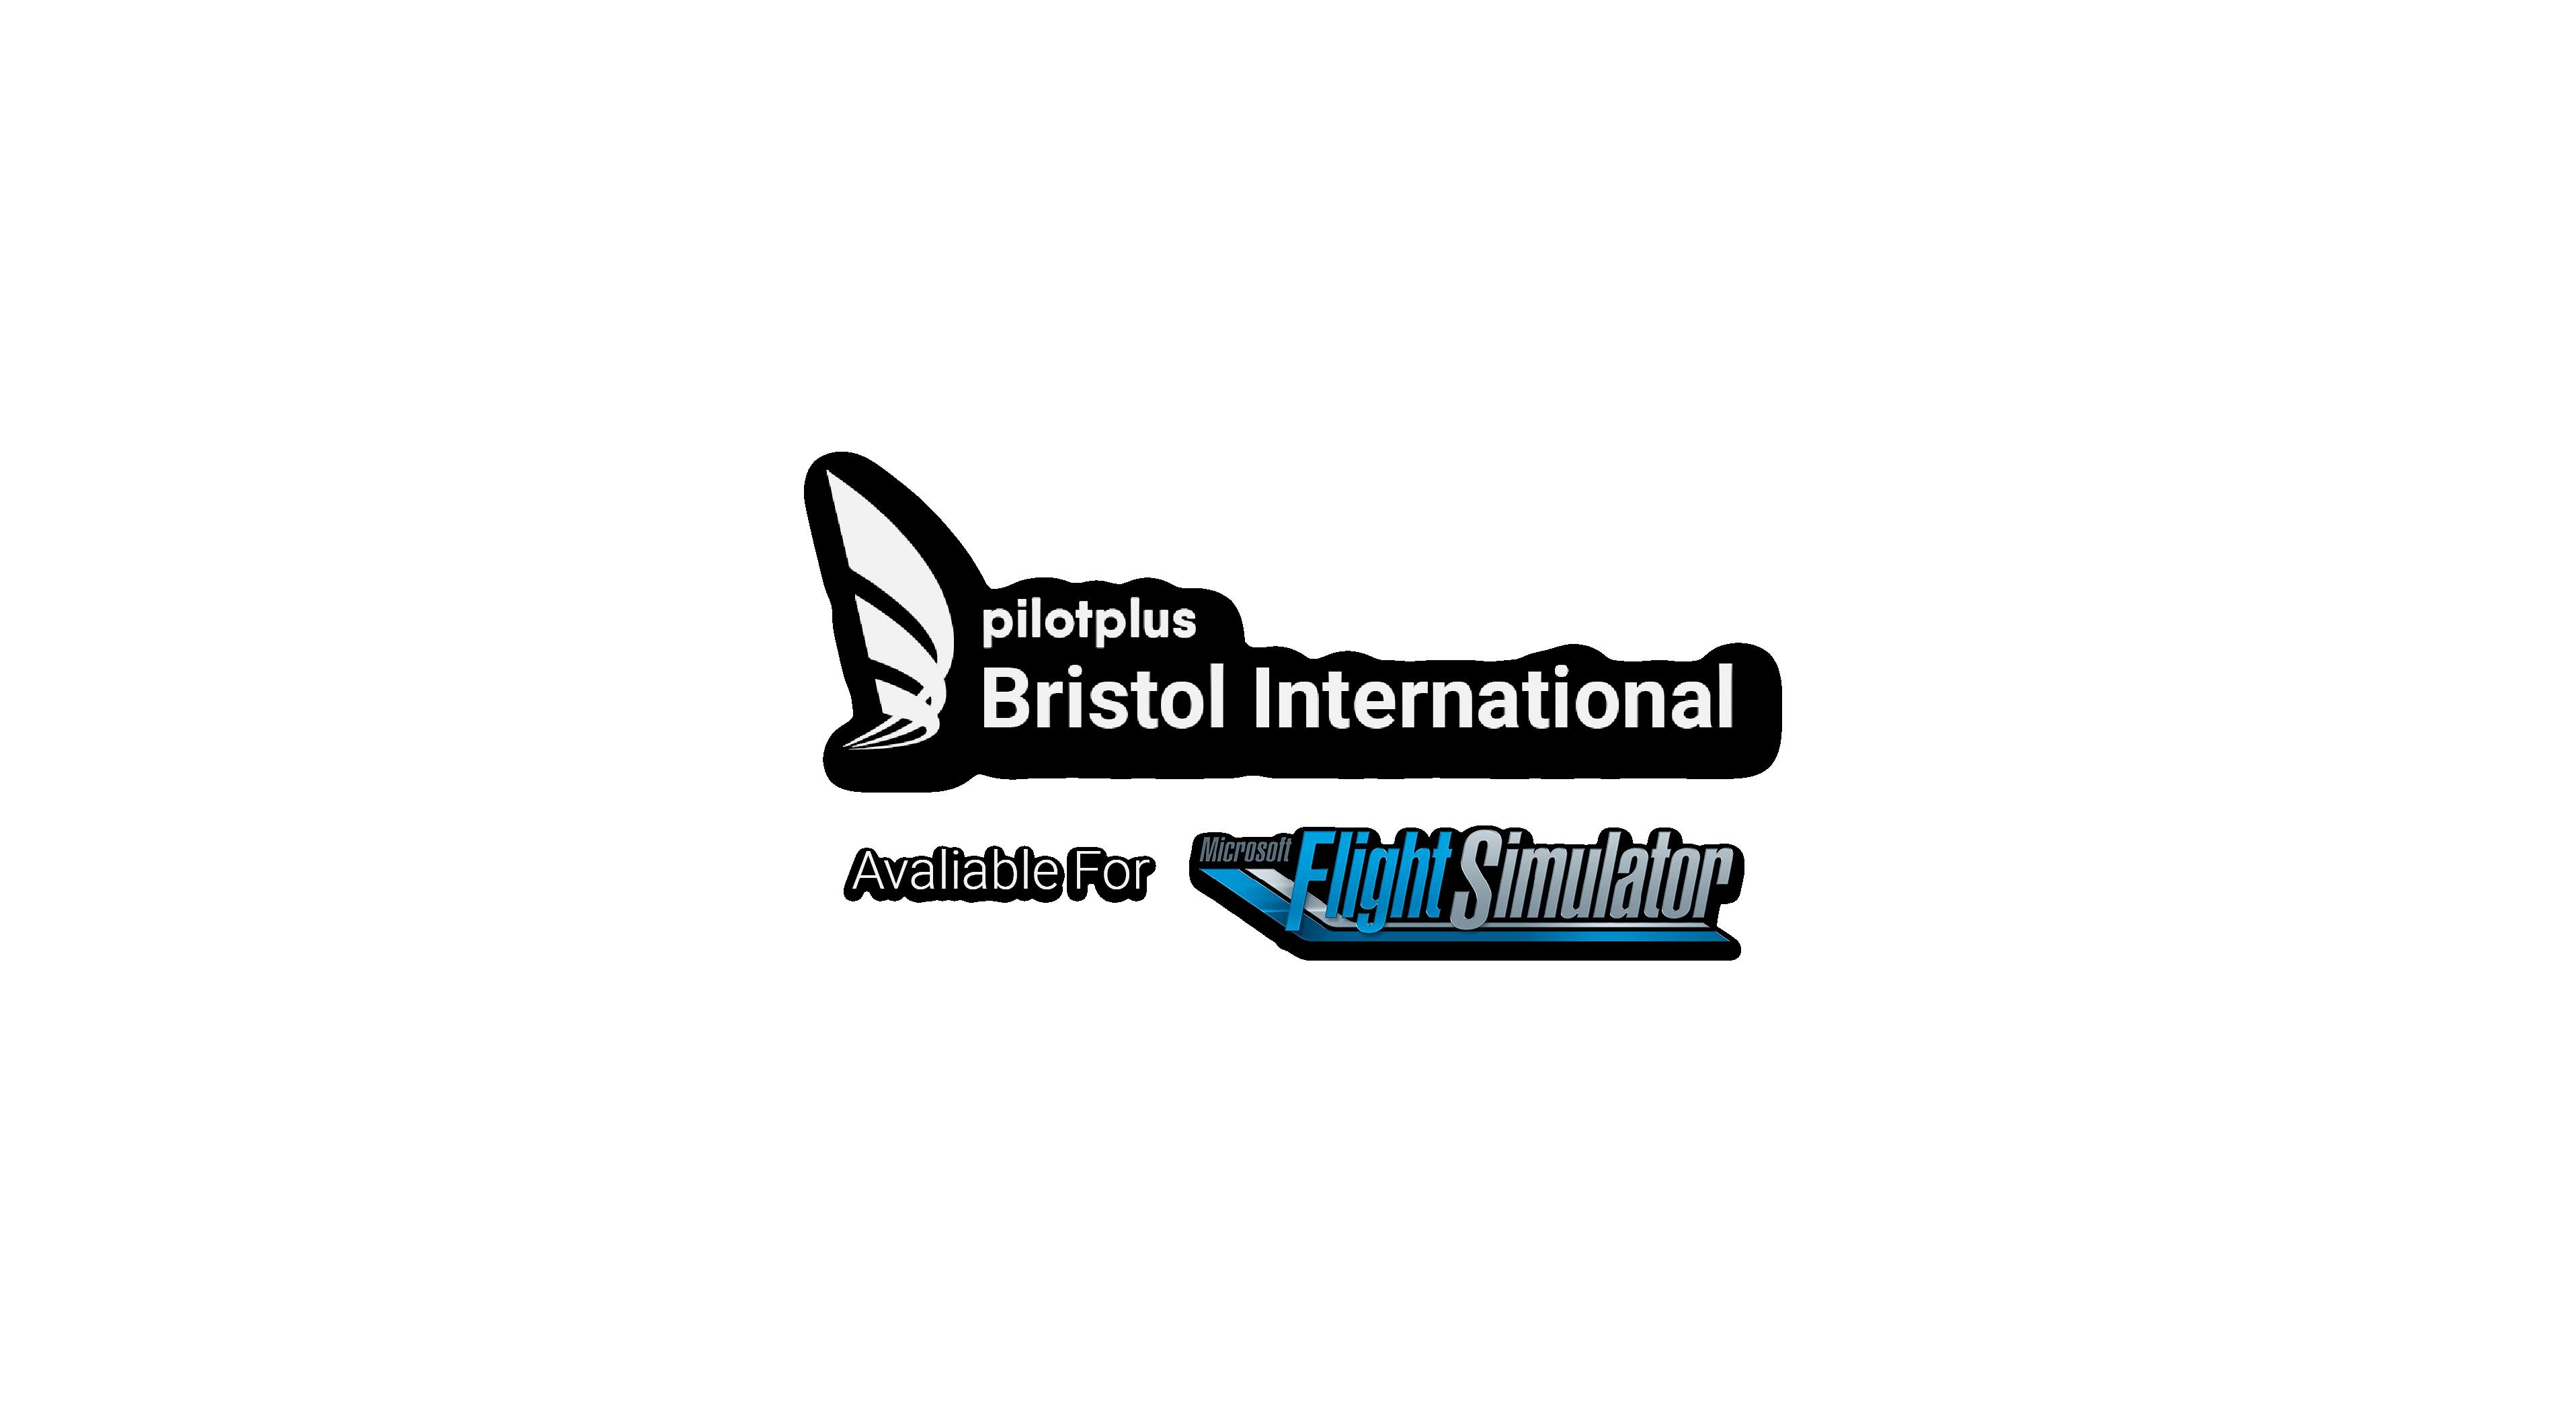 EGGD Bristol International Airport